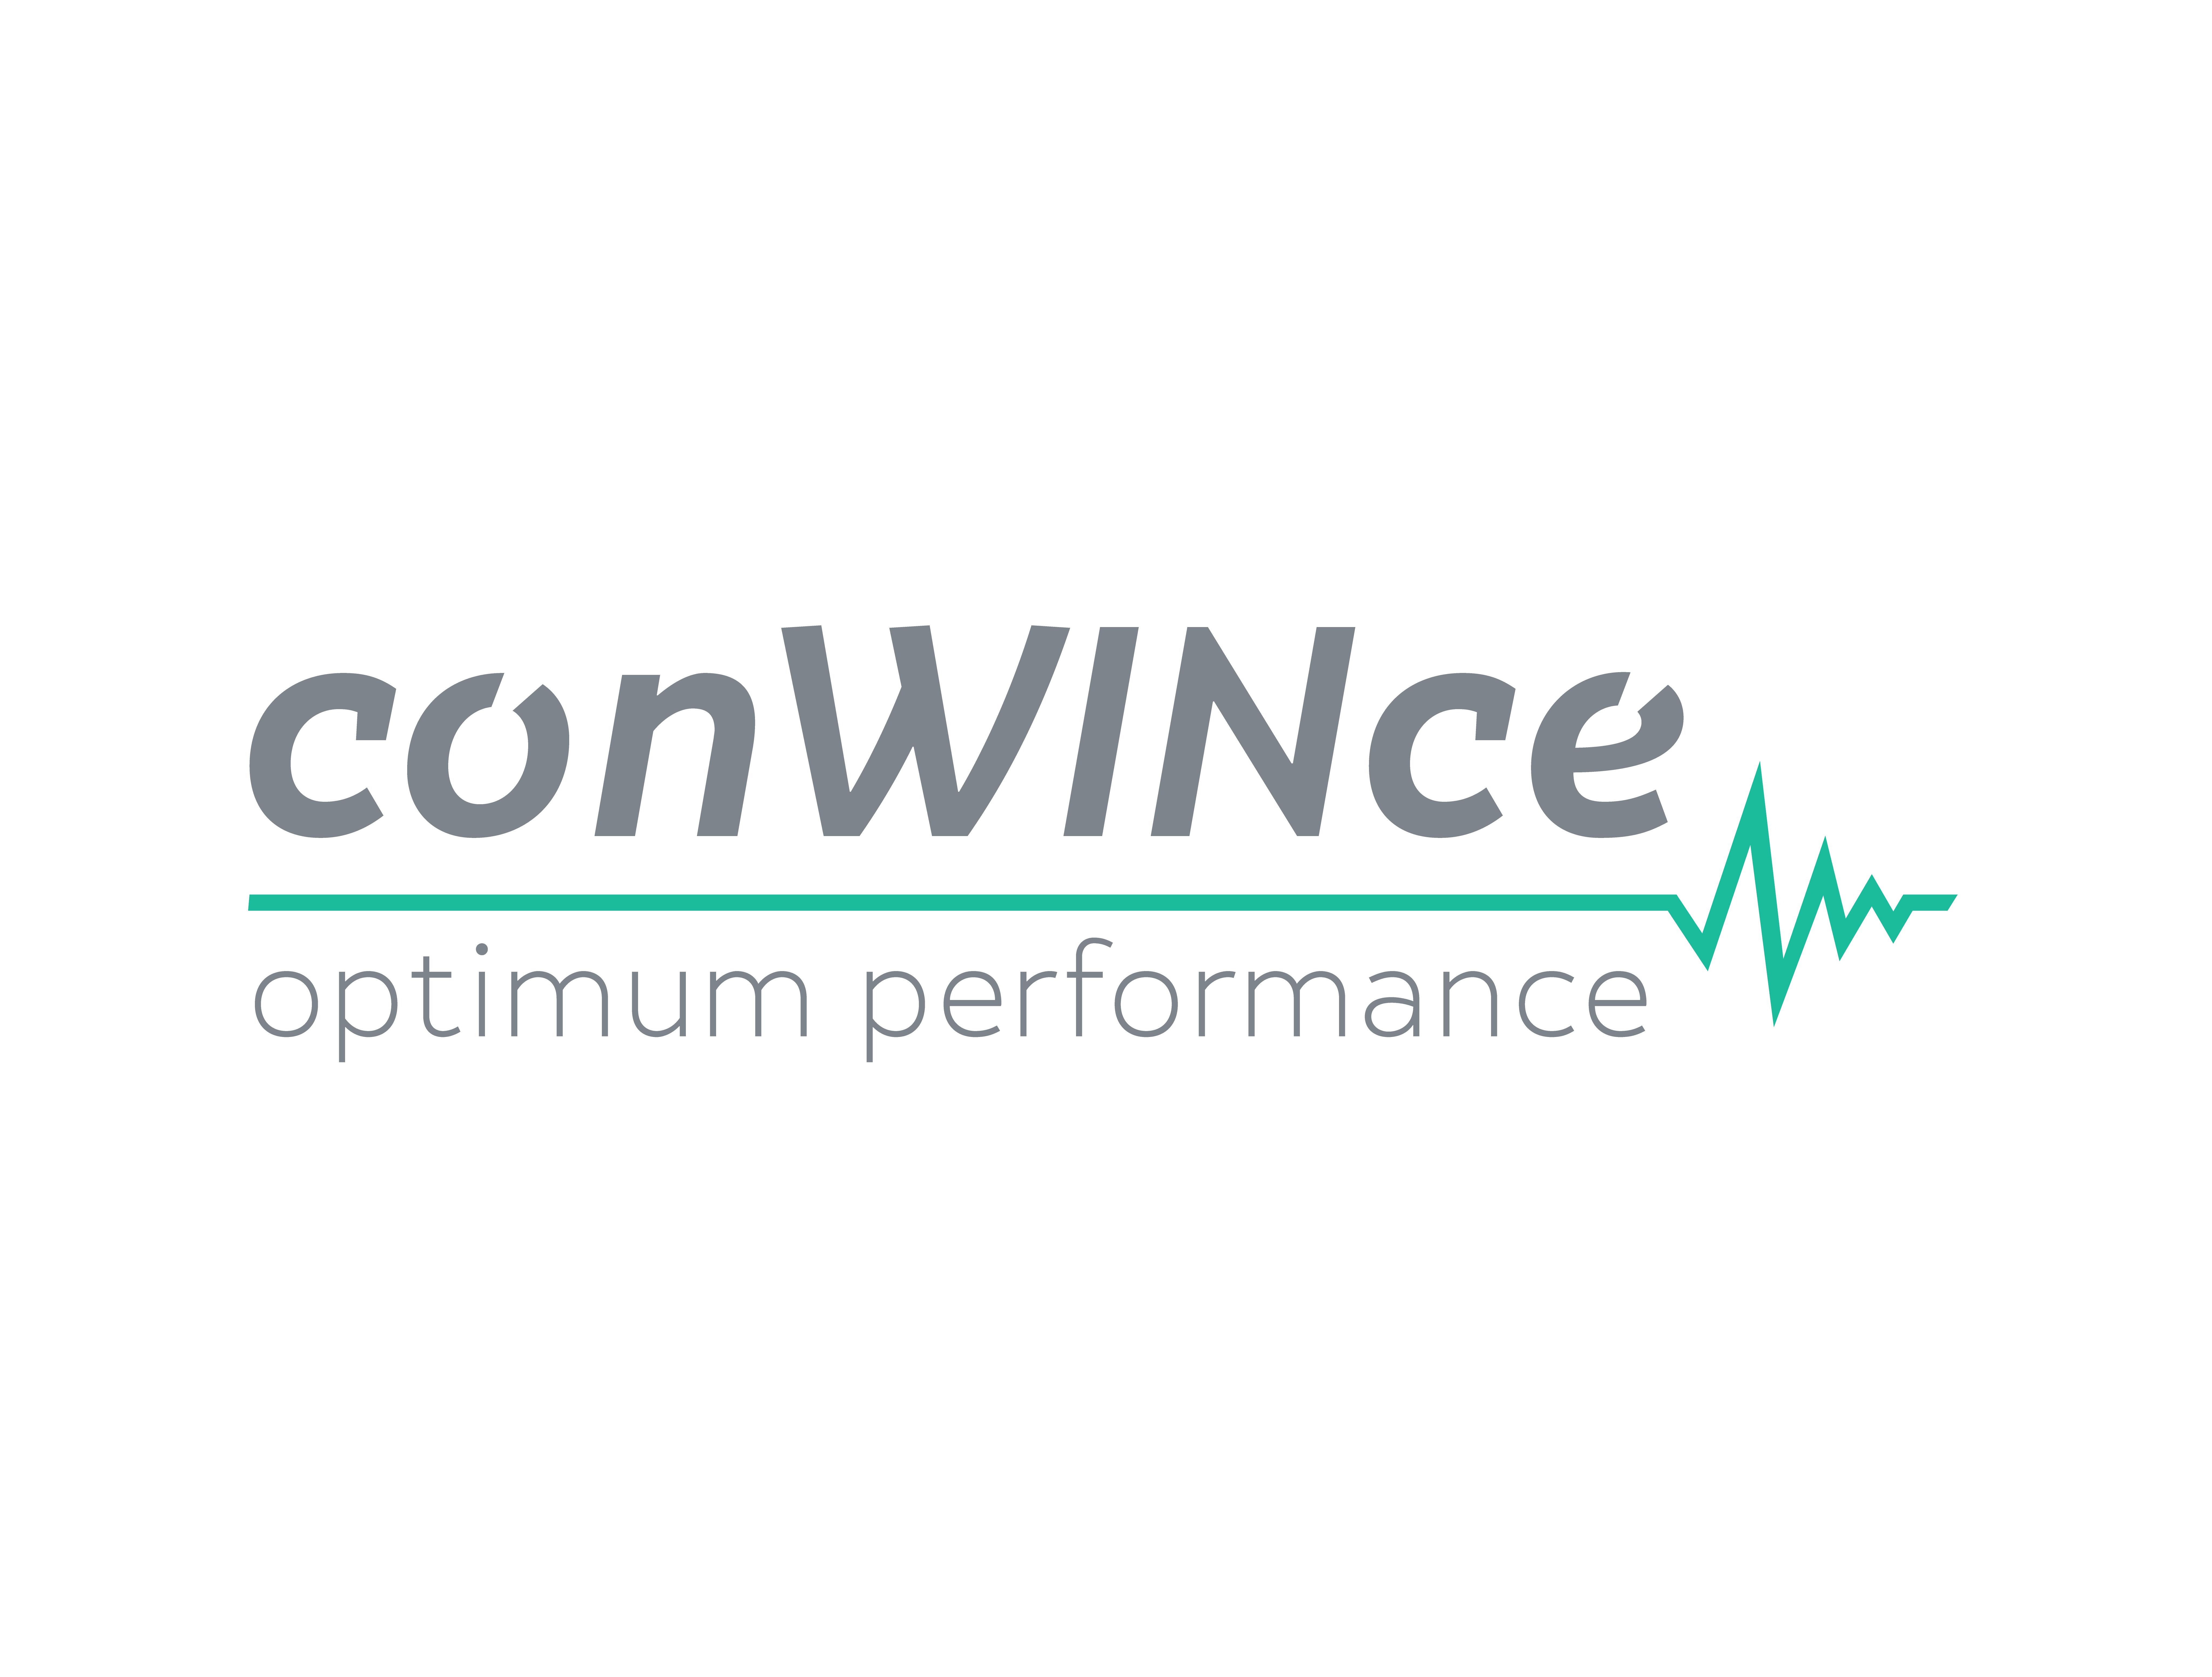 conWINce optimum performance